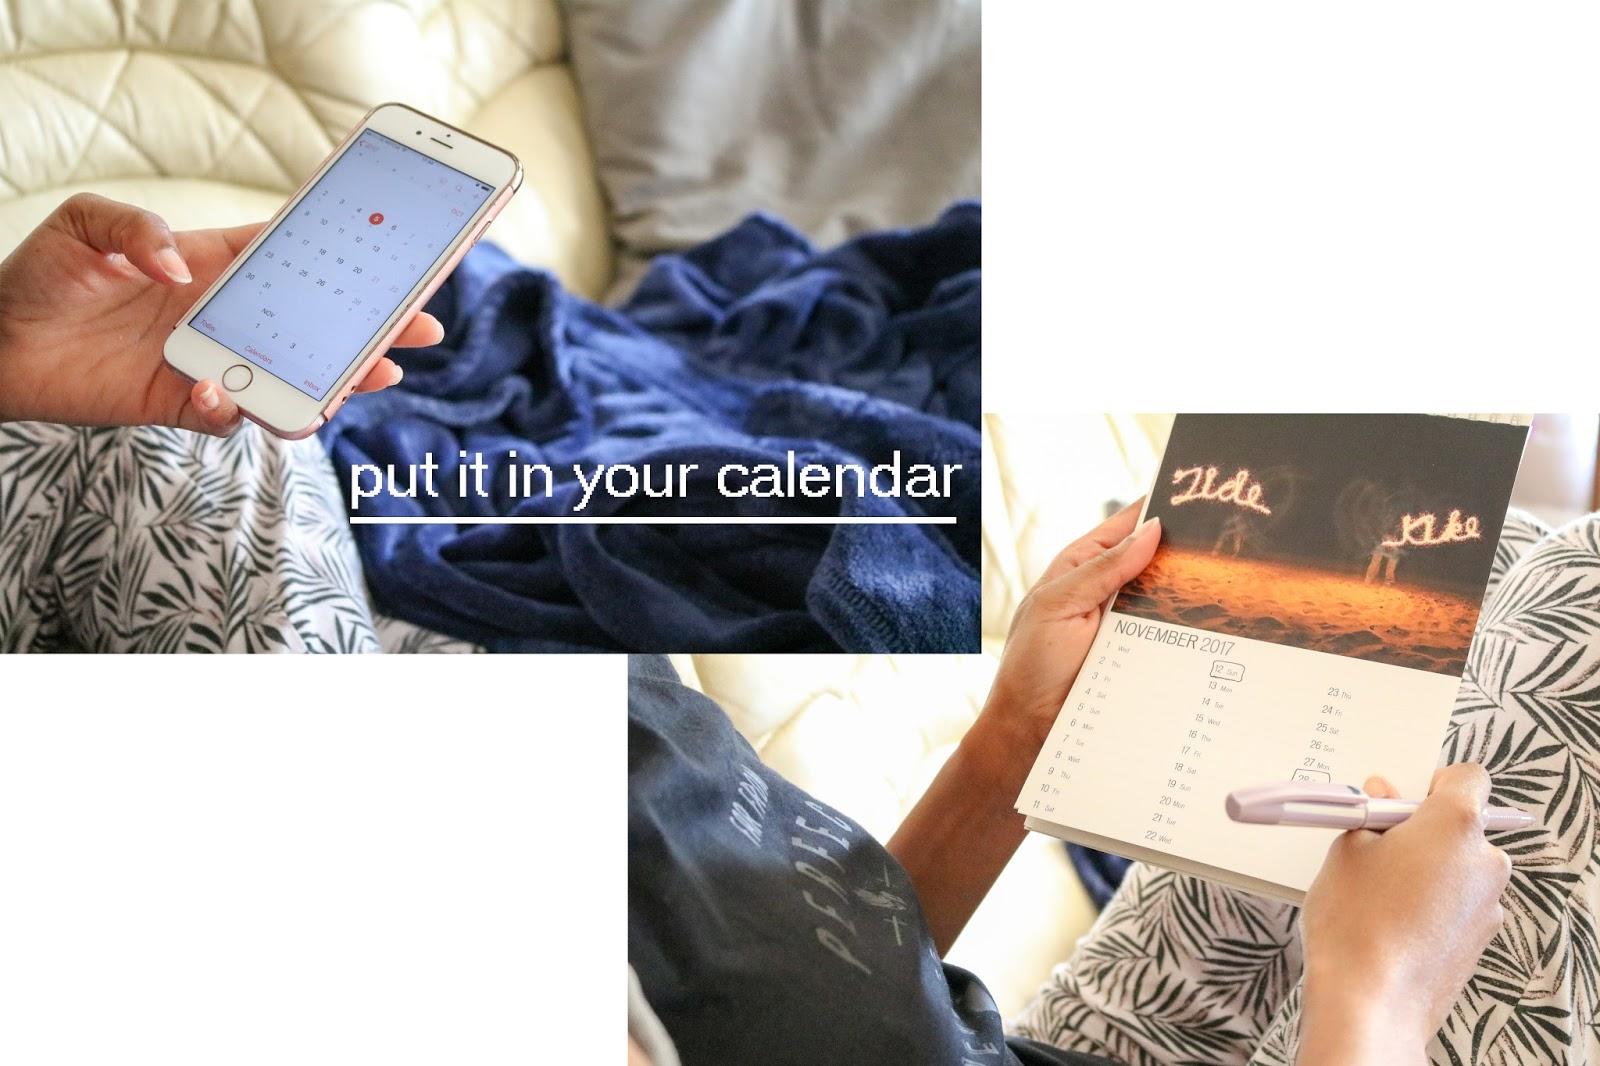 organisation, calendars